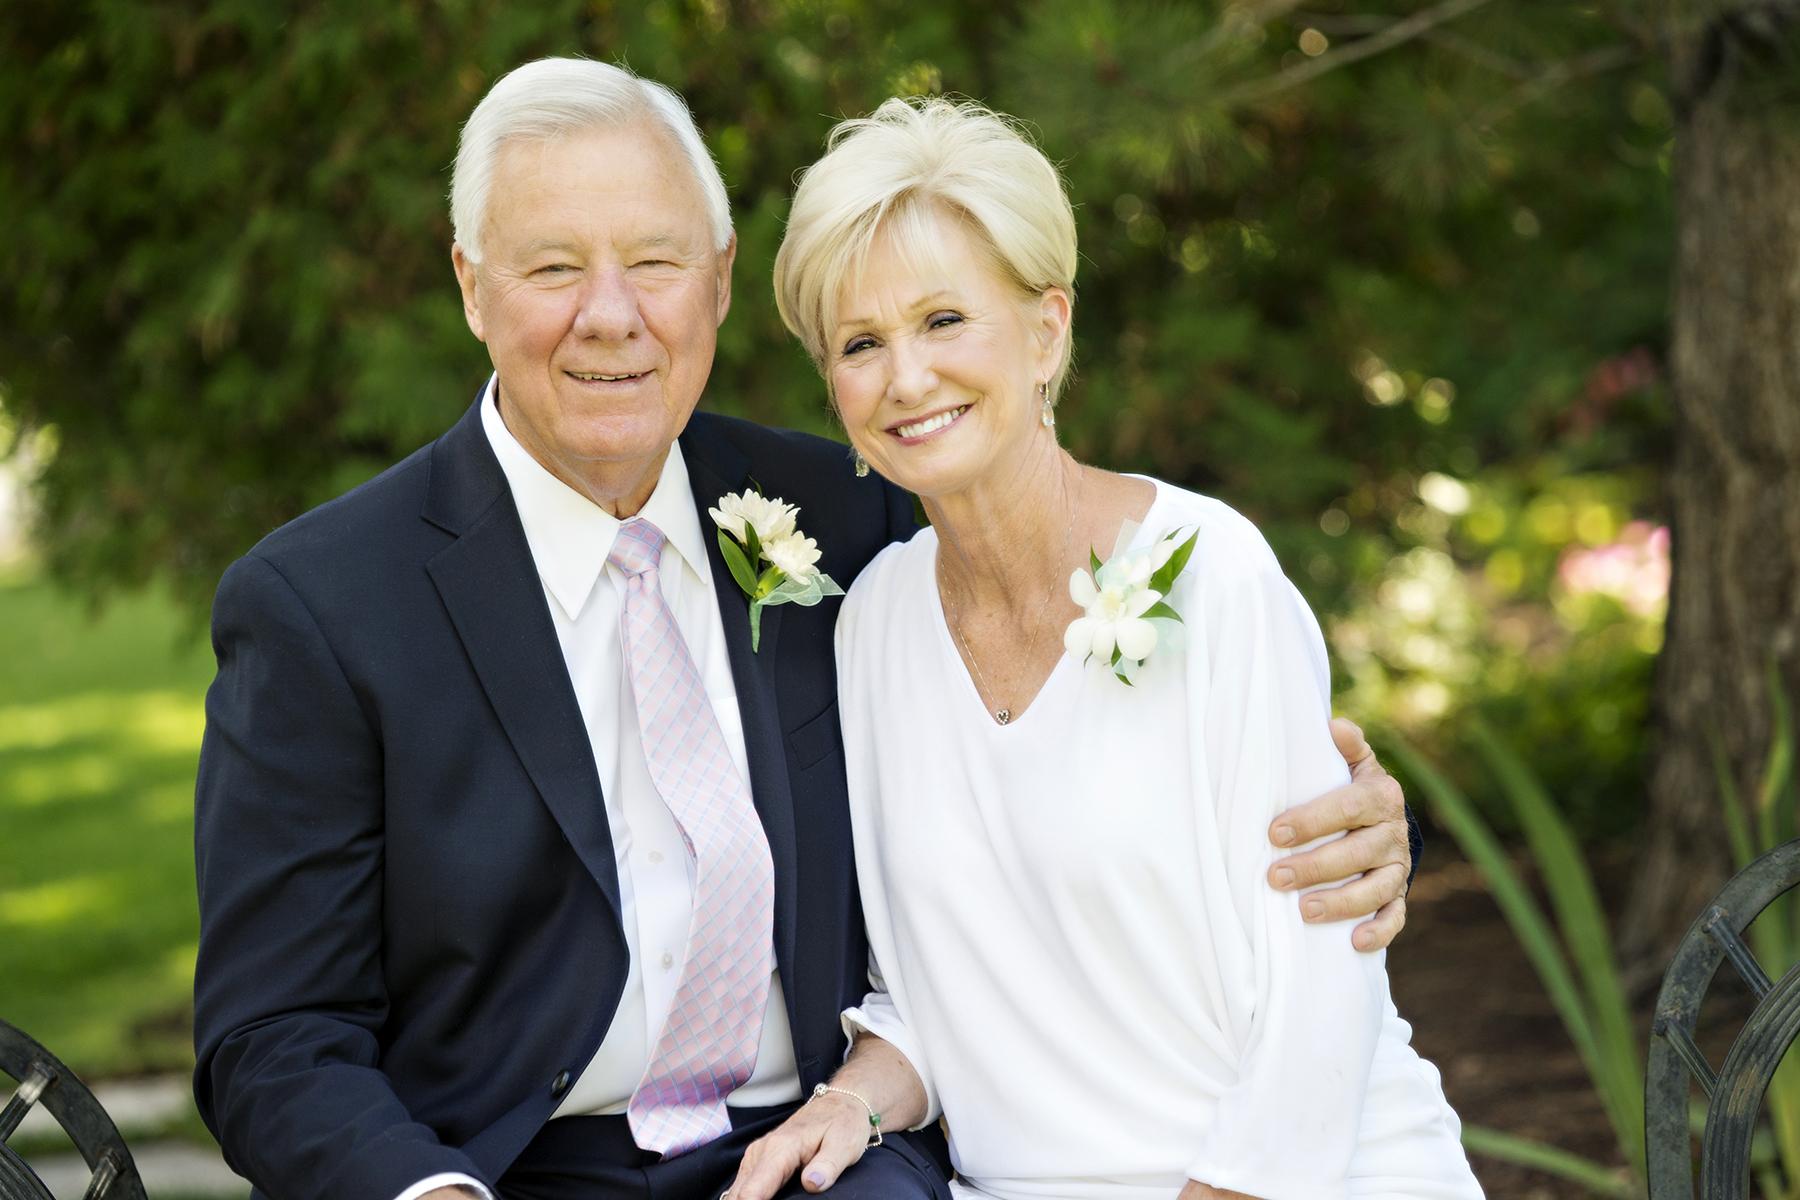 Utah Family Photos Happy Couple Smiling